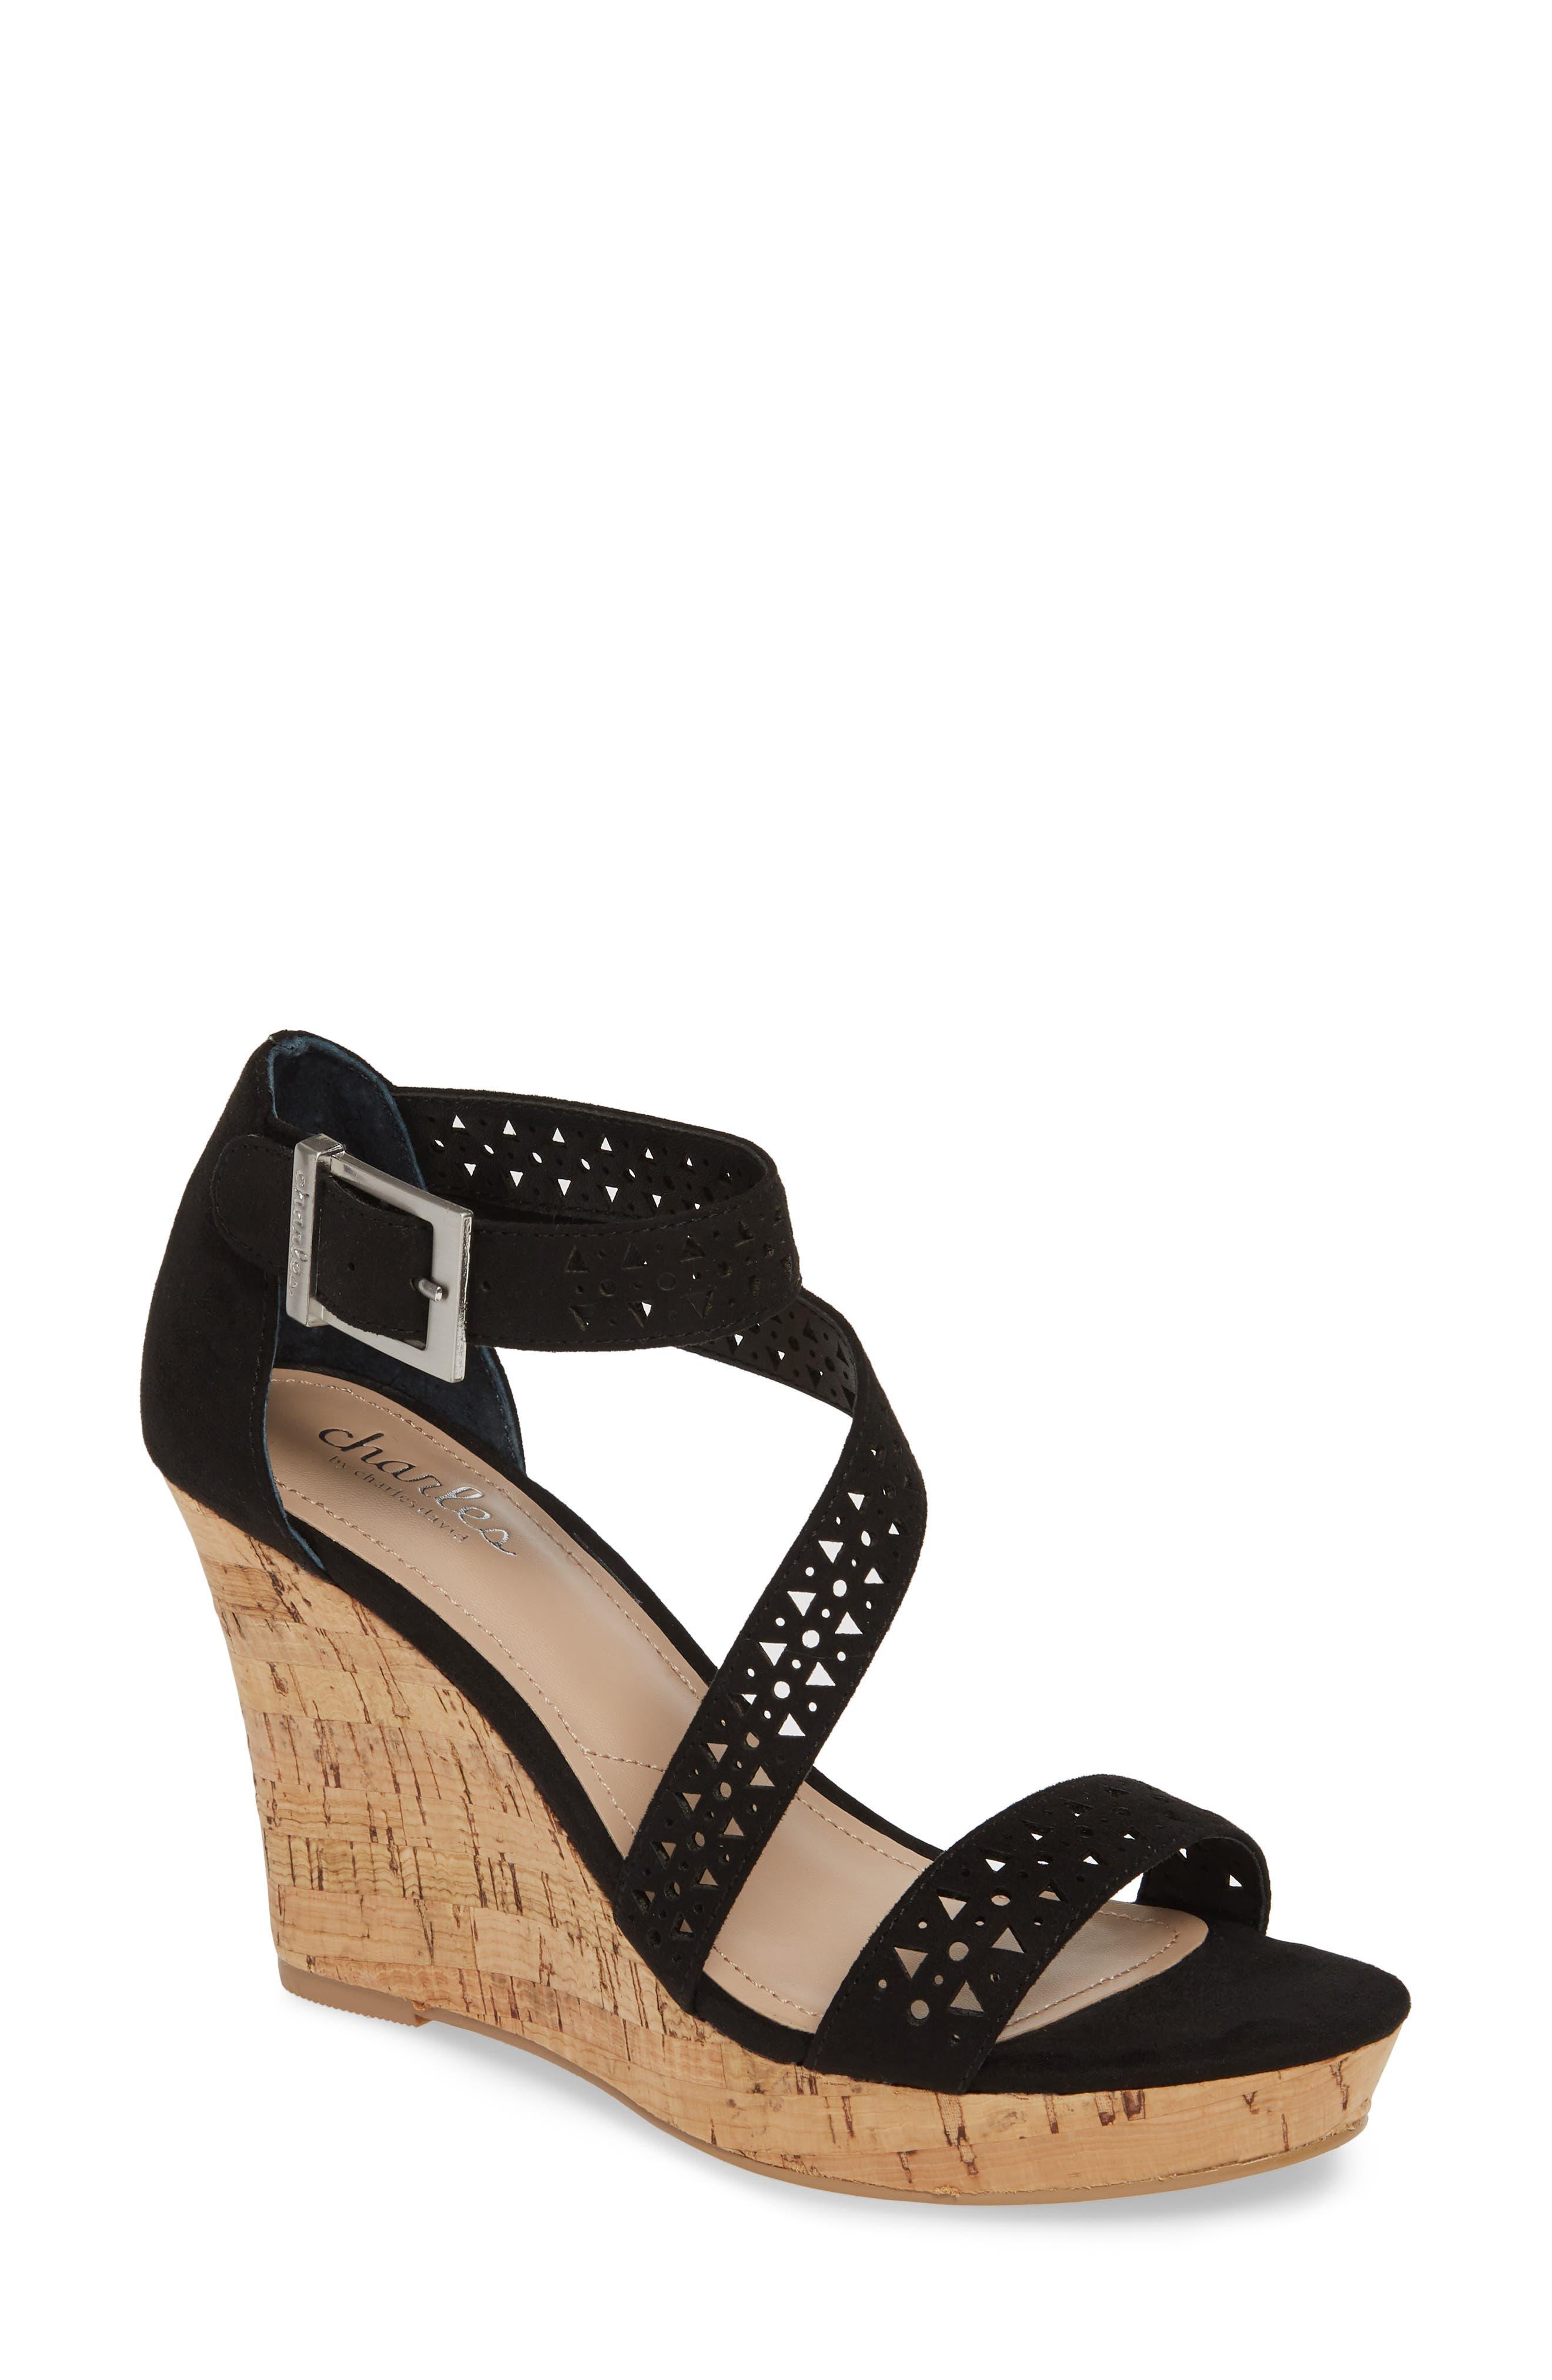 Charles By Charles David Landon Perforated Wedge Sandal- Black